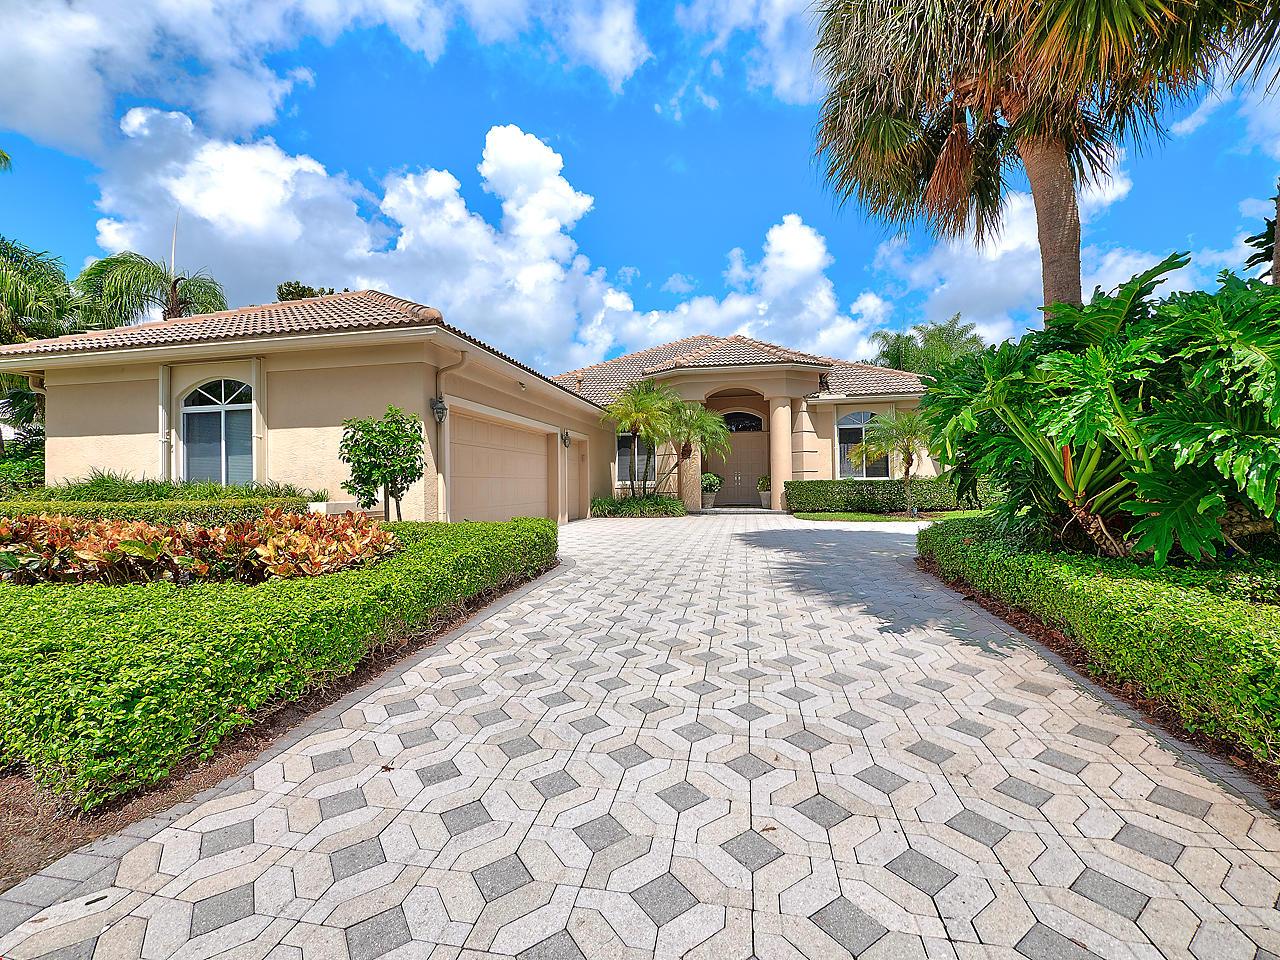 19 Bermuda Lake Drive, Palm Beach Gardens, Florida 33418, 4 Bedrooms Bedrooms, ,3.2 BathroomsBathrooms,A,Single family,Bermuda Lake,RX-10468996